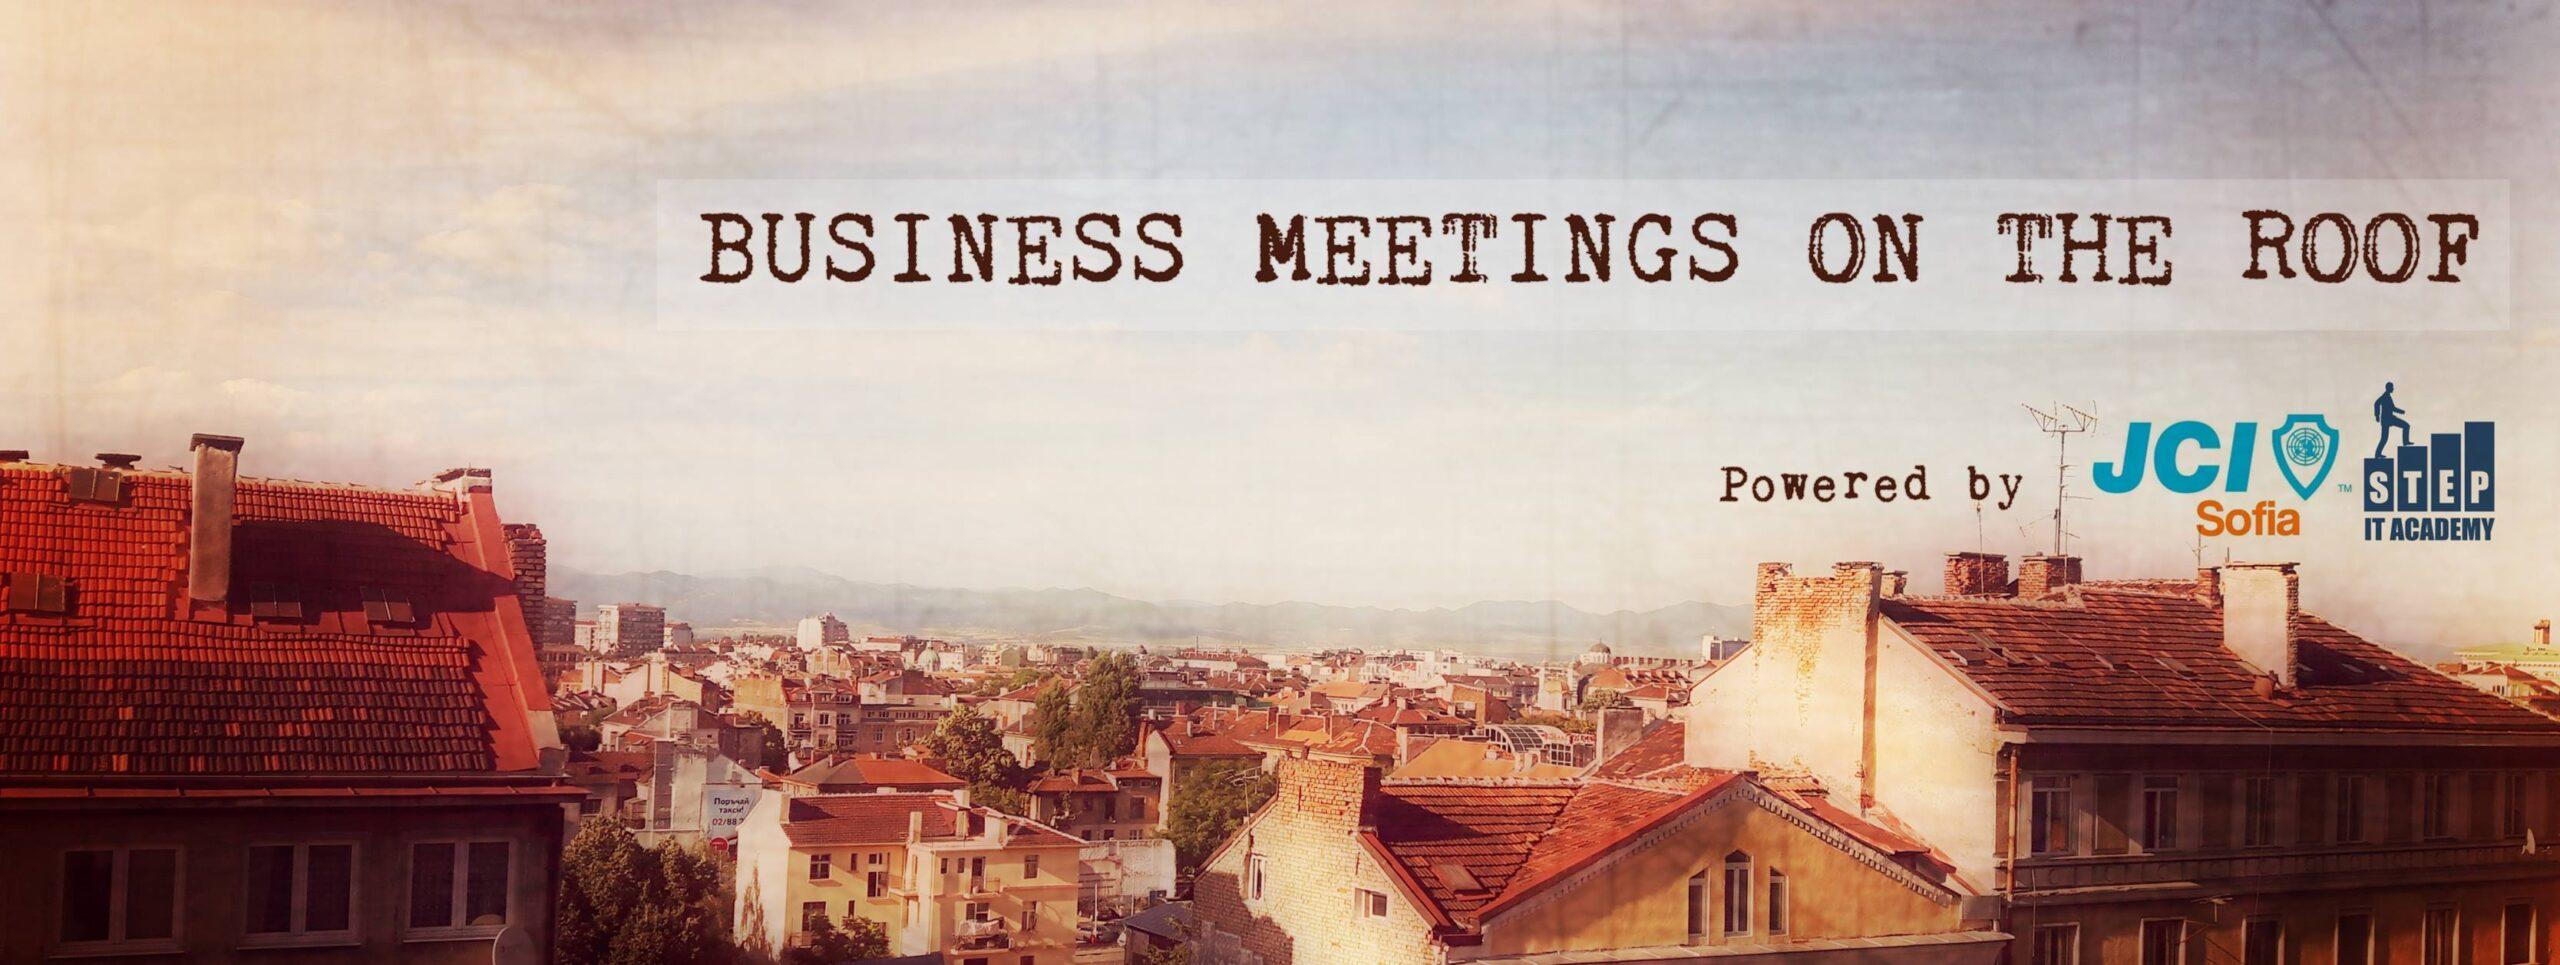 jci-sofia-business-networking